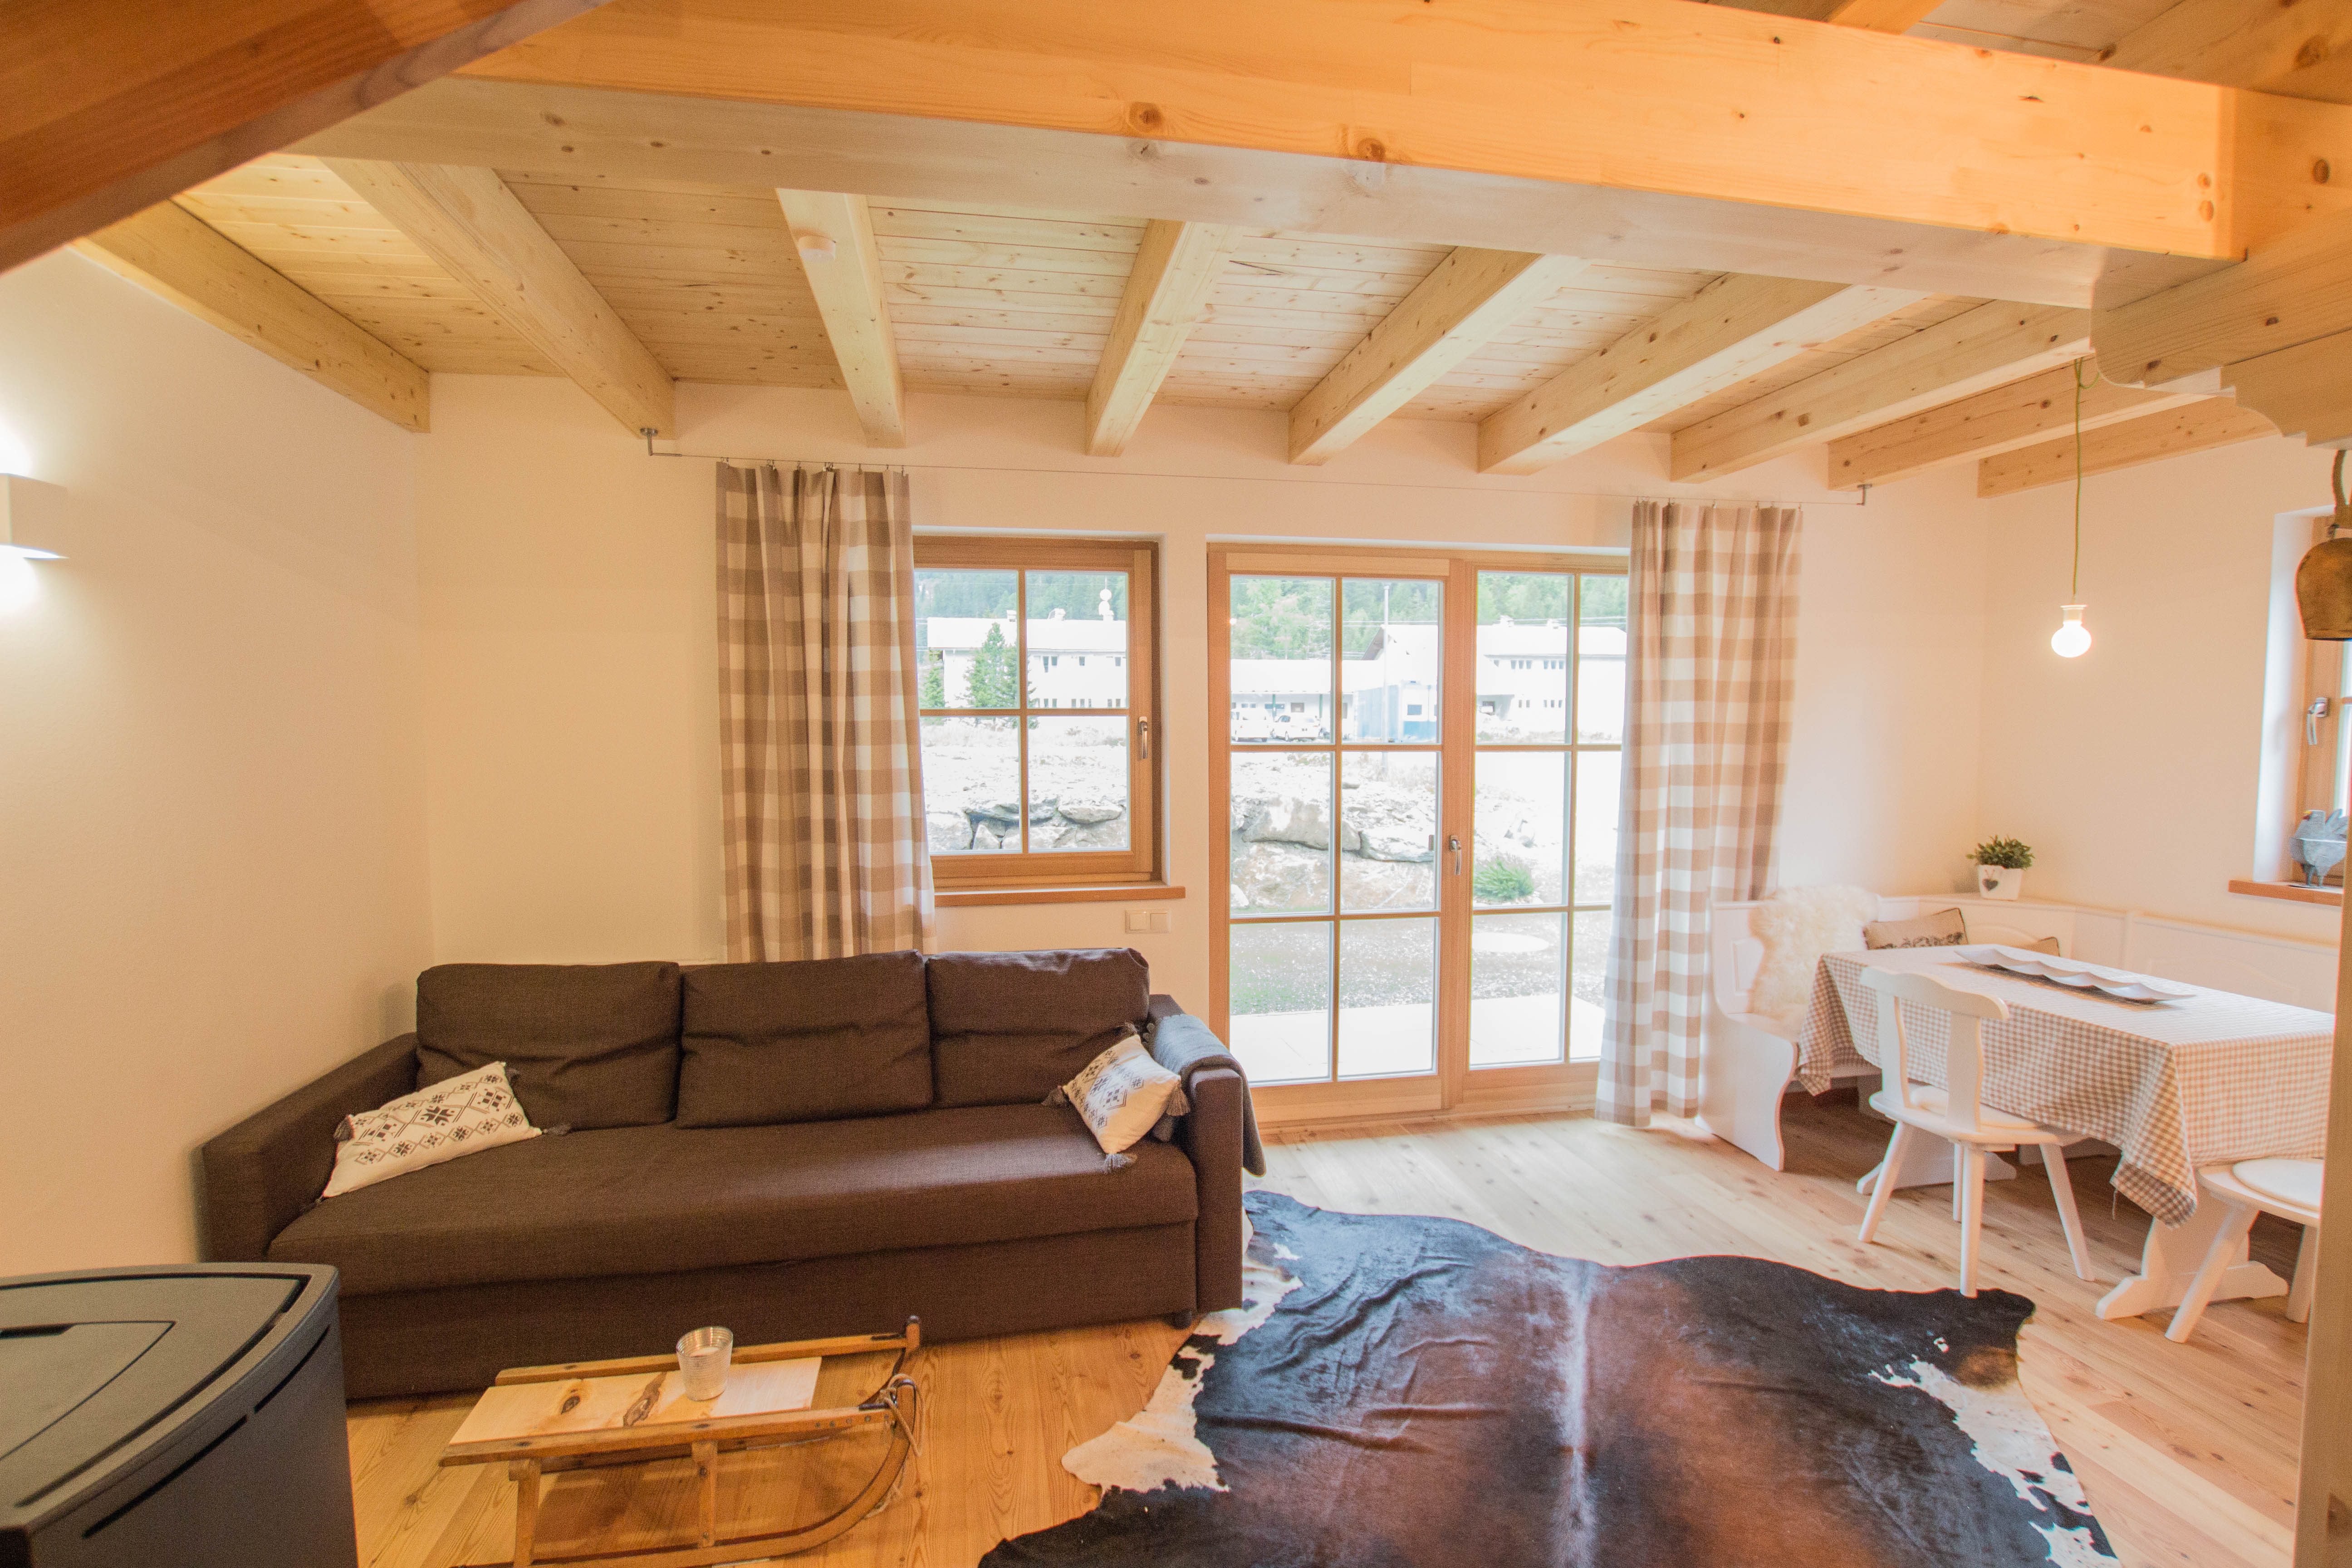 Maison de vacances Lodge Kleiner Bär direkt am Skilift (2050394), Uttendorf, Pinzgau, Salzbourg, Autriche, image 14